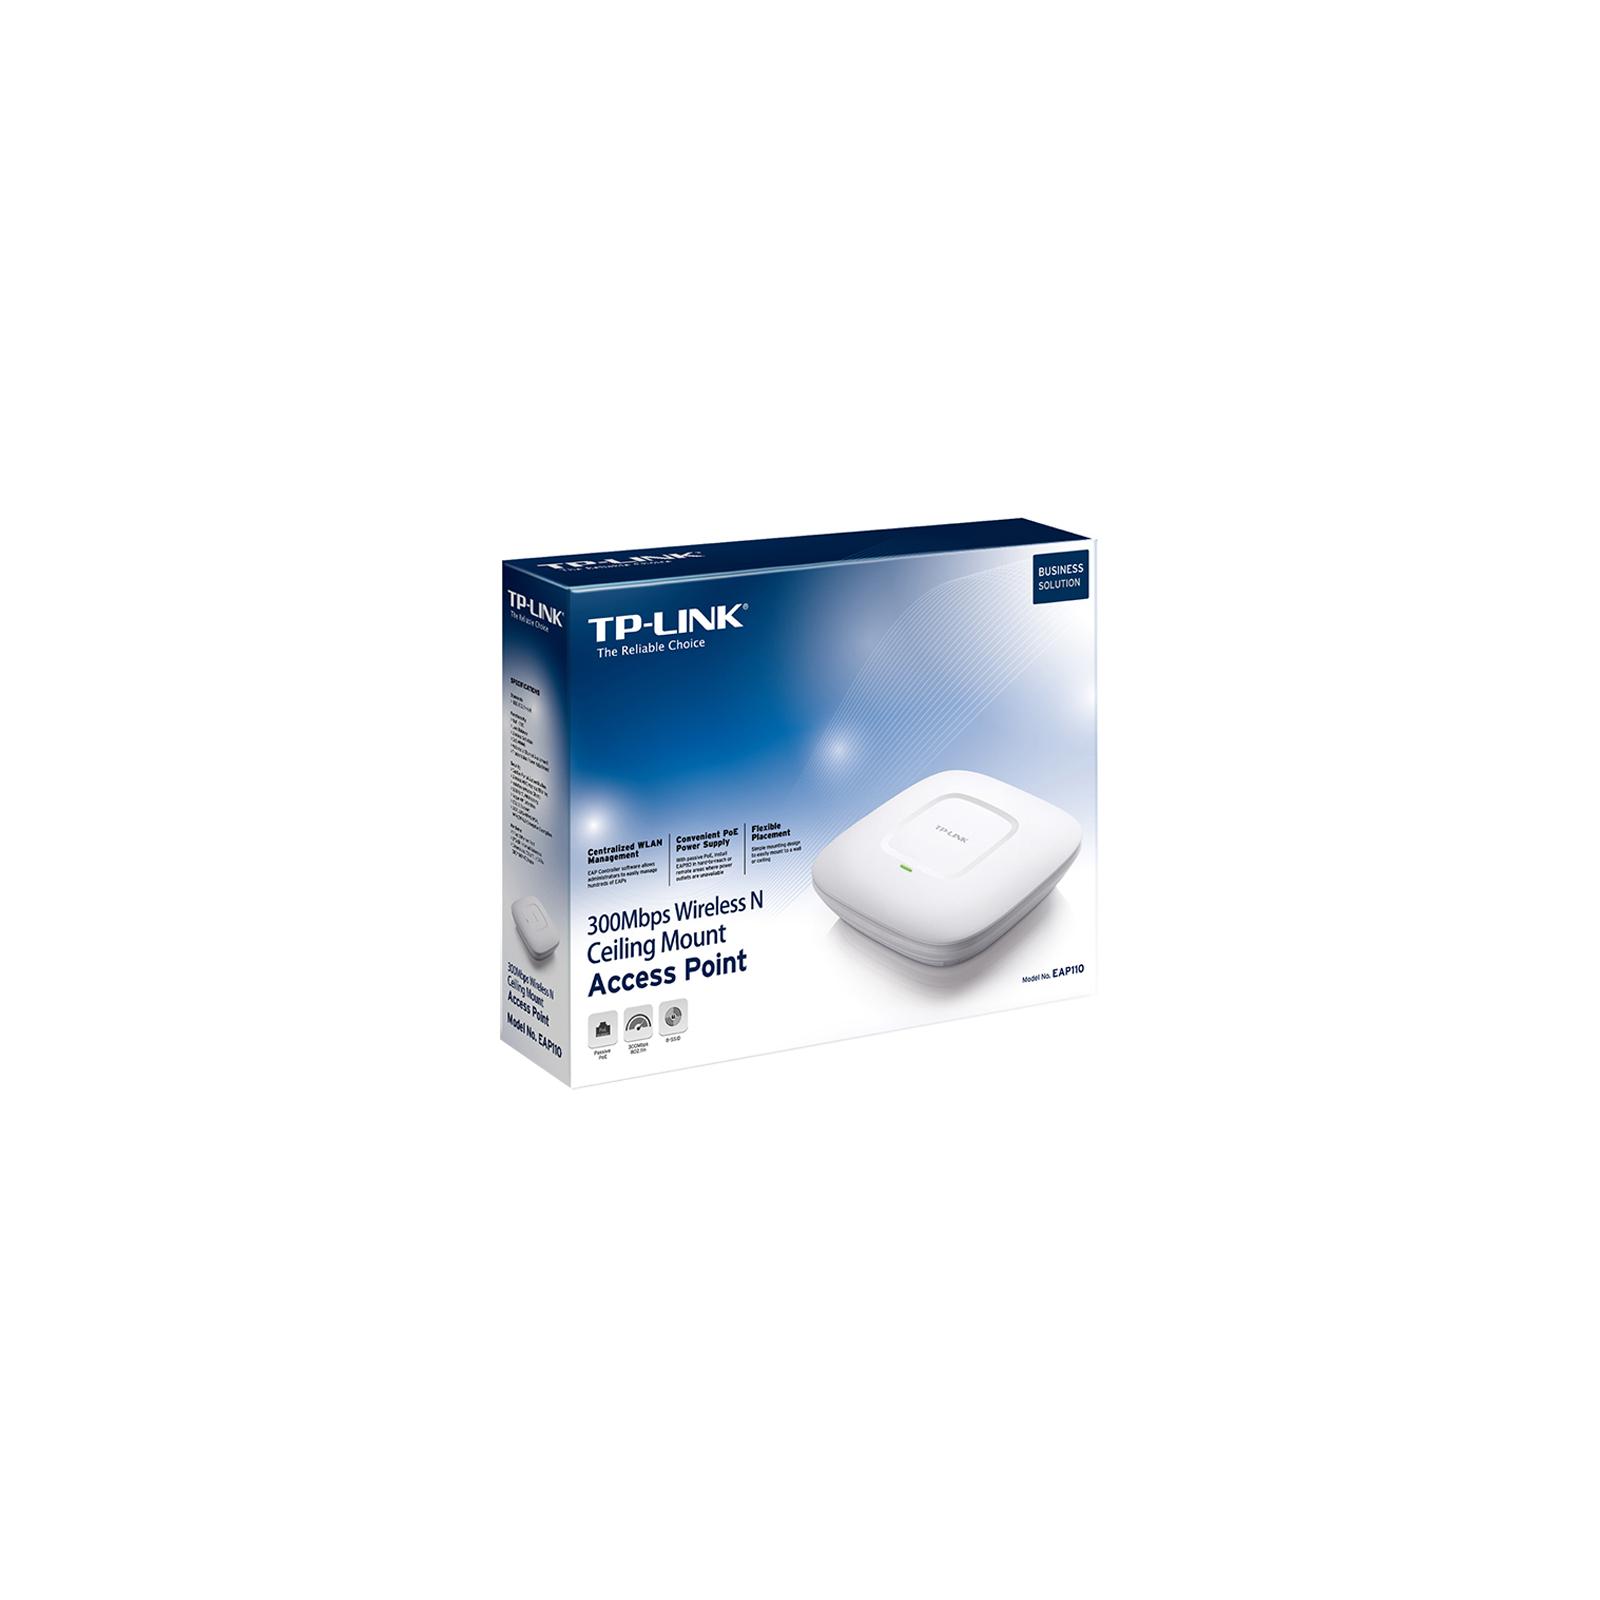 Точка доступа Wi-Fi TP-Link EAP110 изображение 4